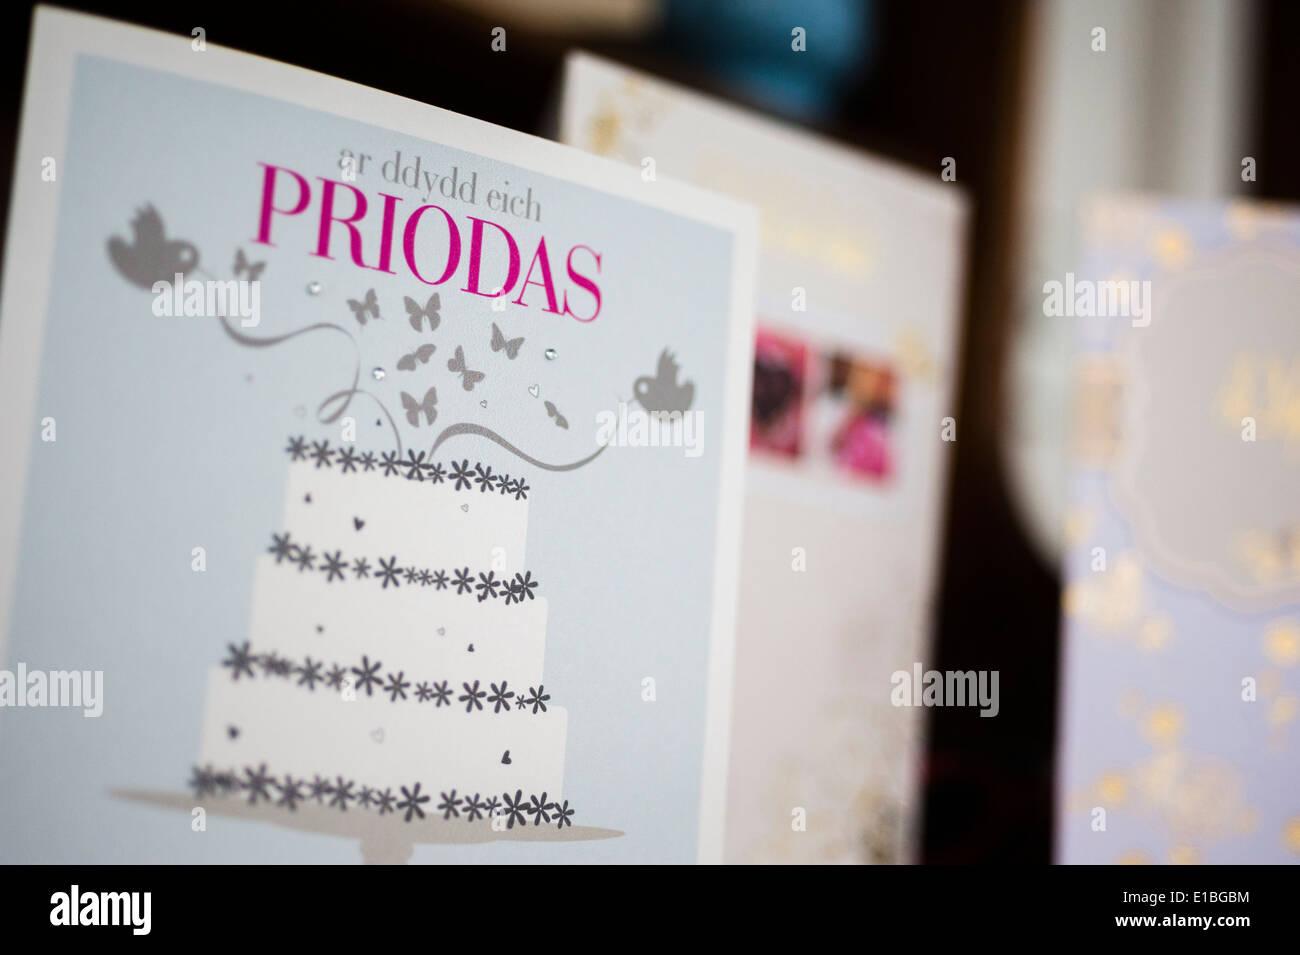 Wedding Cards Stock Photos & Wedding Cards Stock Images - Alamy